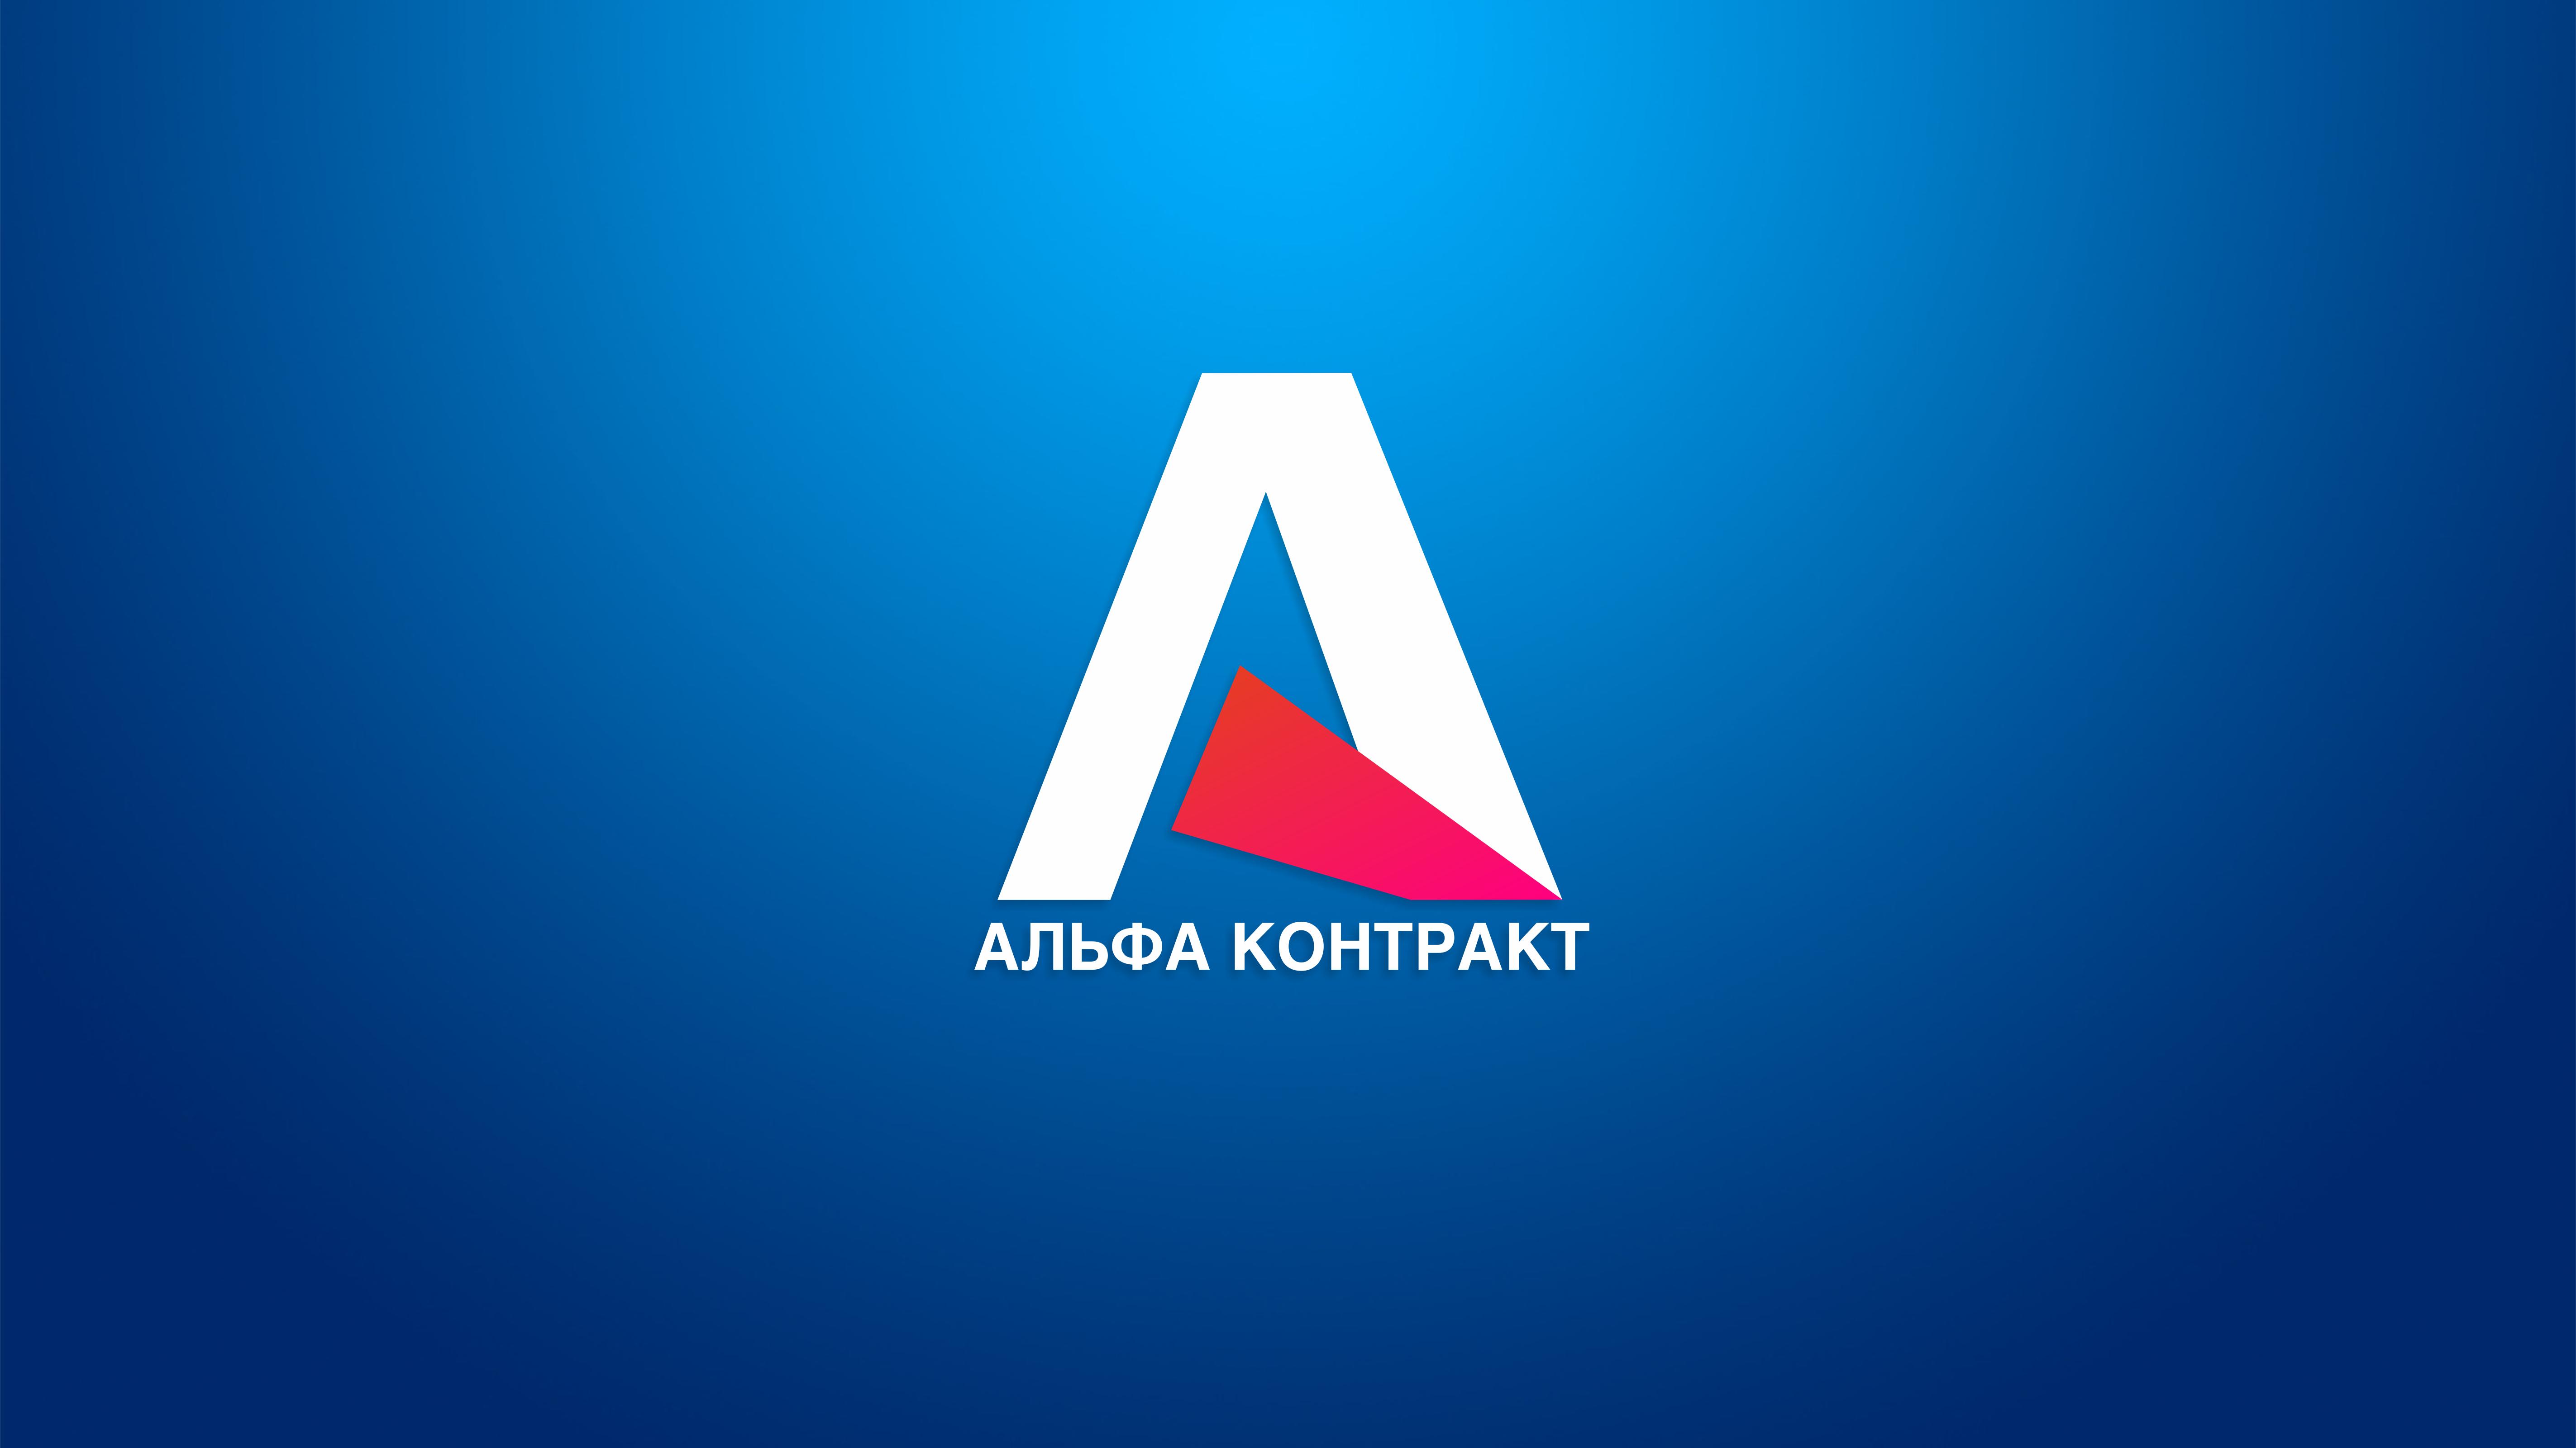 Дизайнер для разработки логотипа компании фото f_9405bfaa55845ce3.png